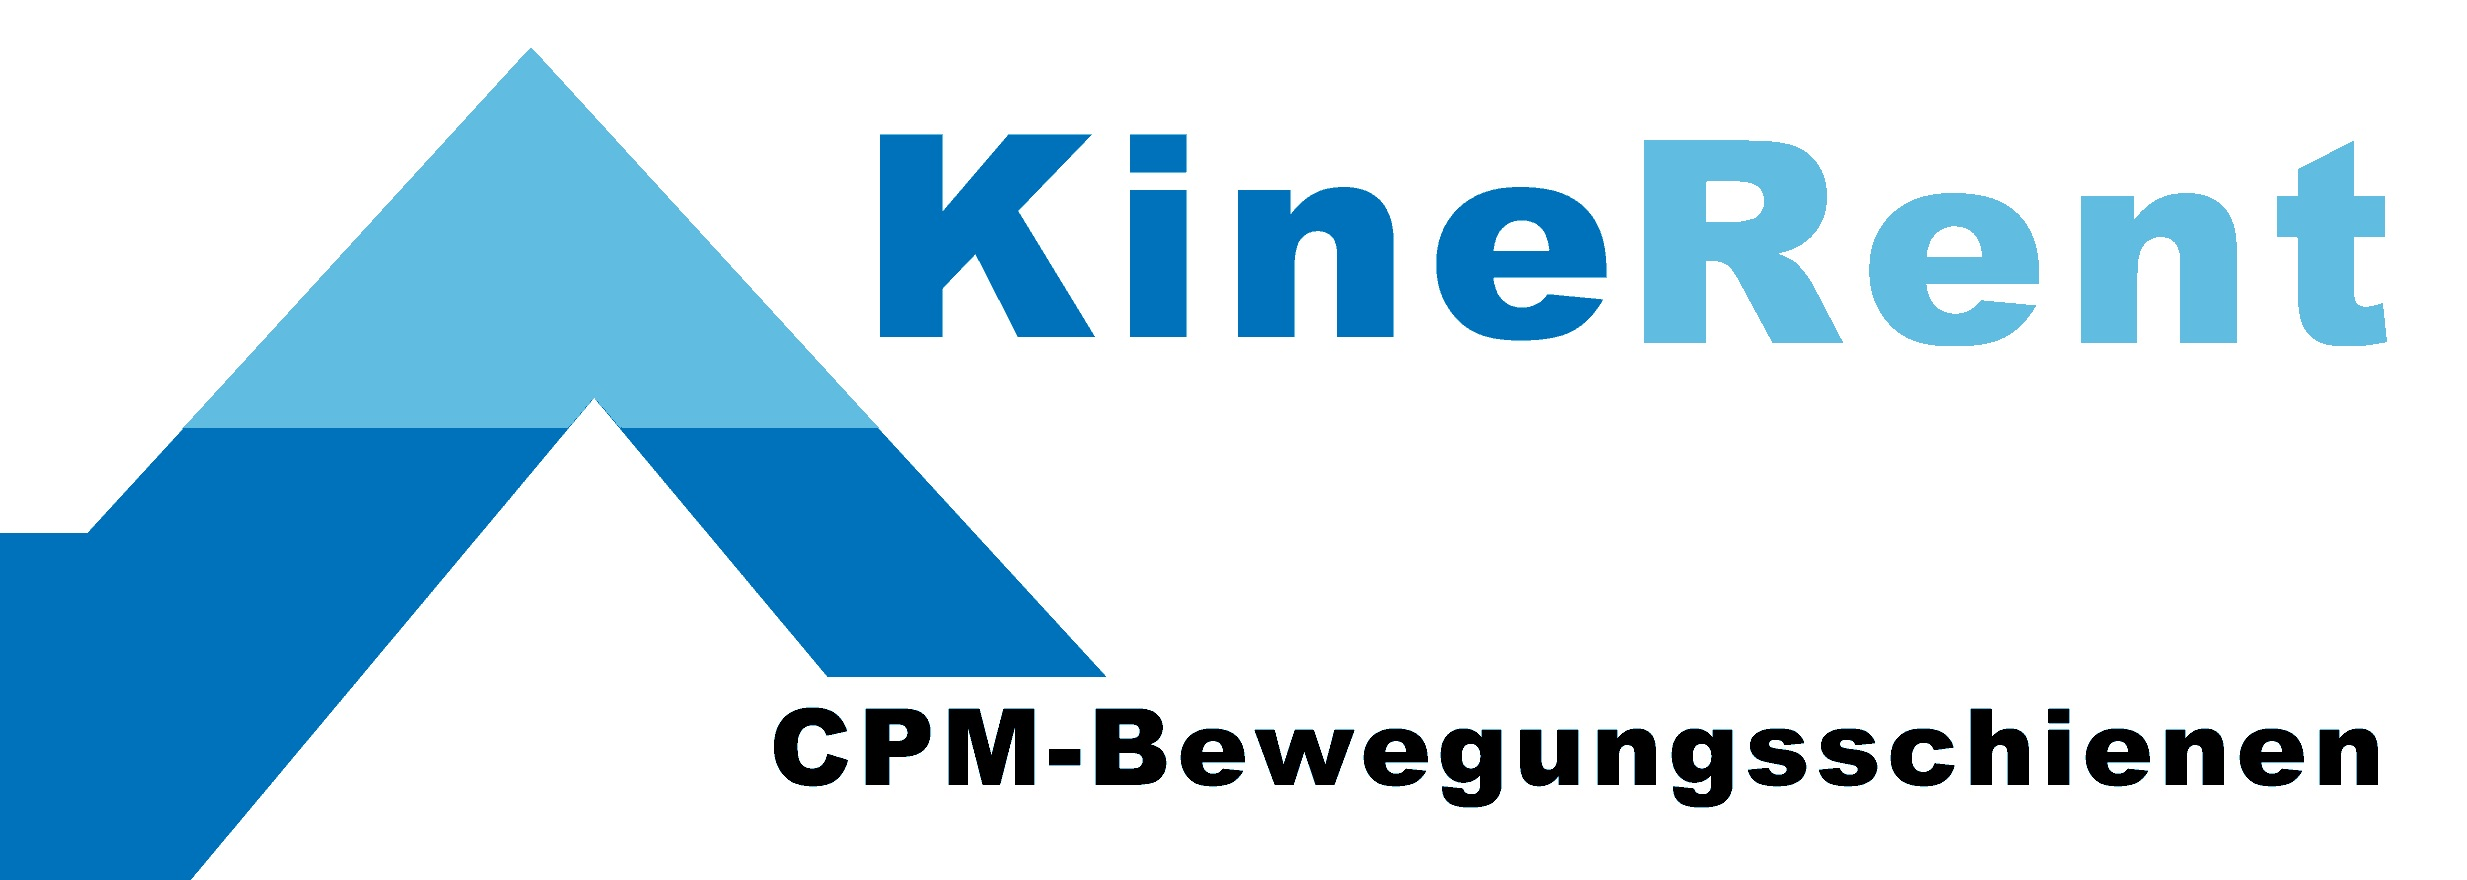 KineRent CPM-Bewegungsschienen